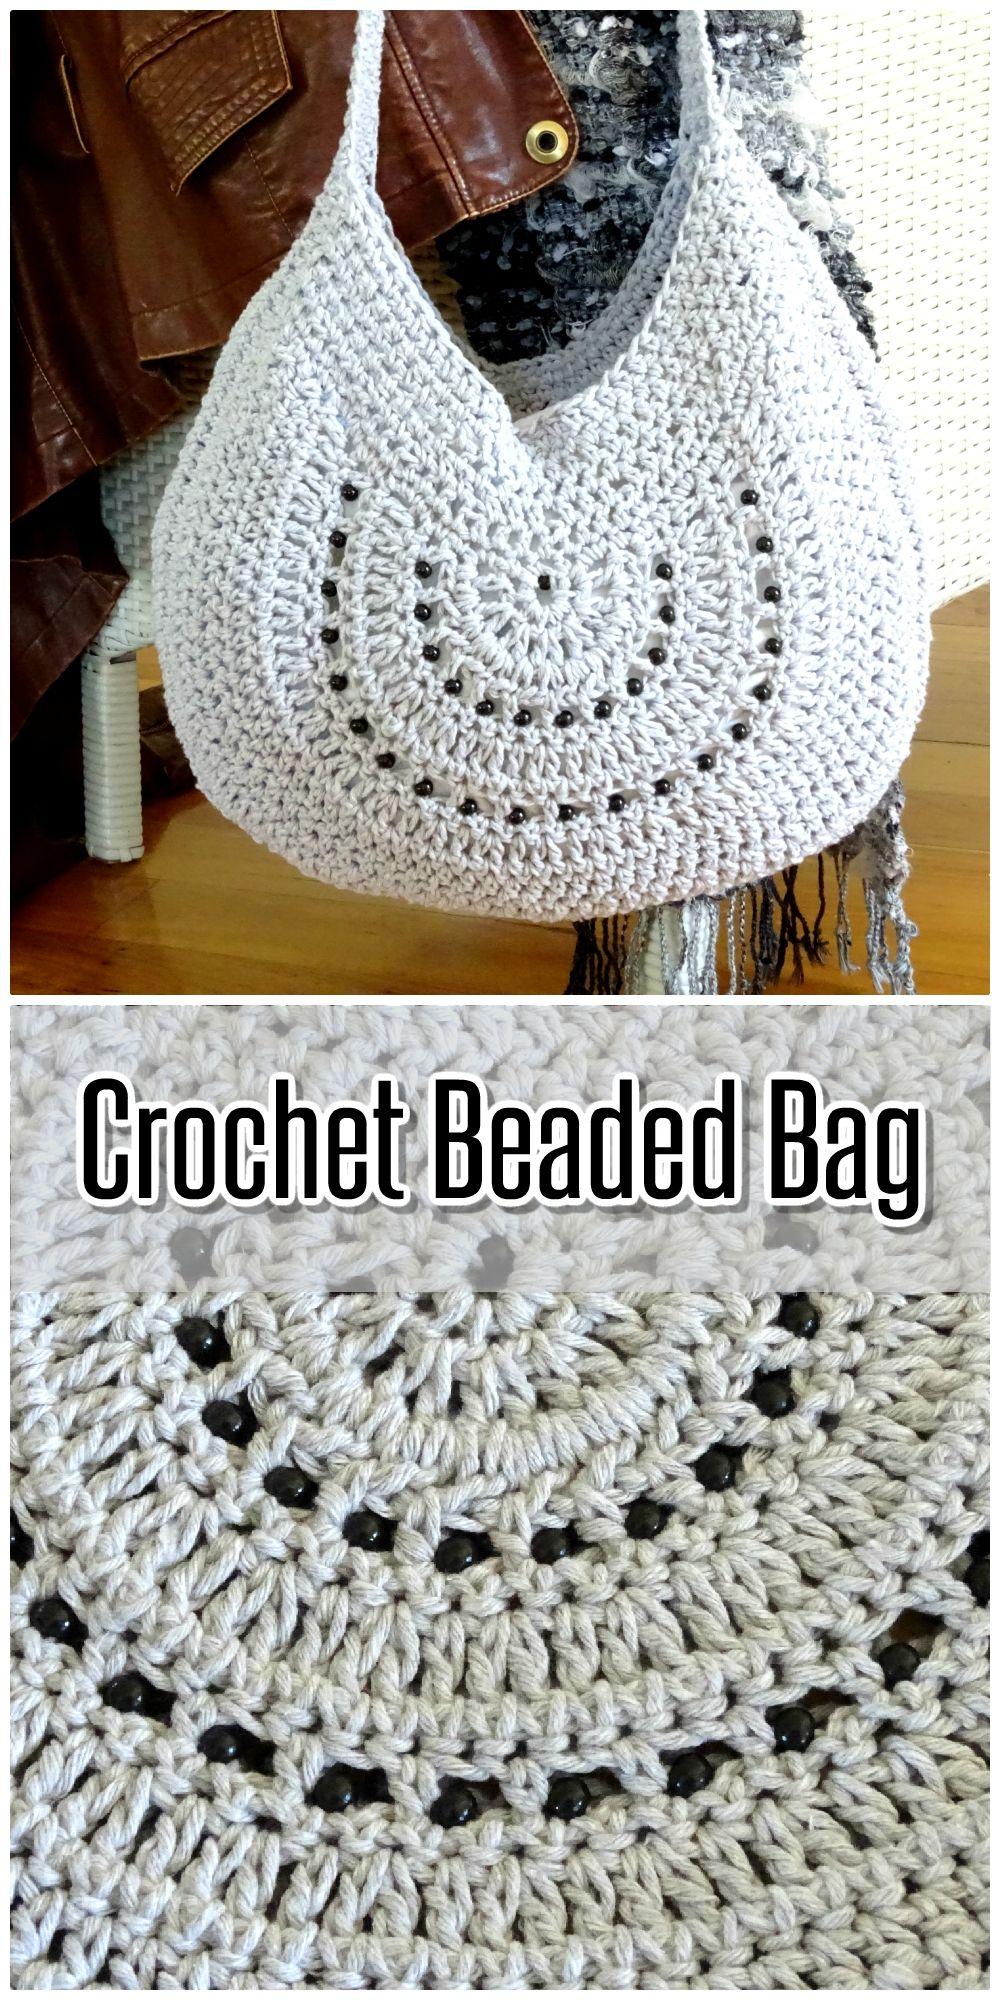 Crochet Bag | Cotton Tote Beach Bag | Beaded Boho Shoulder Bag | Handmade Womens Handbag | Womens Ladies Accessories #beads